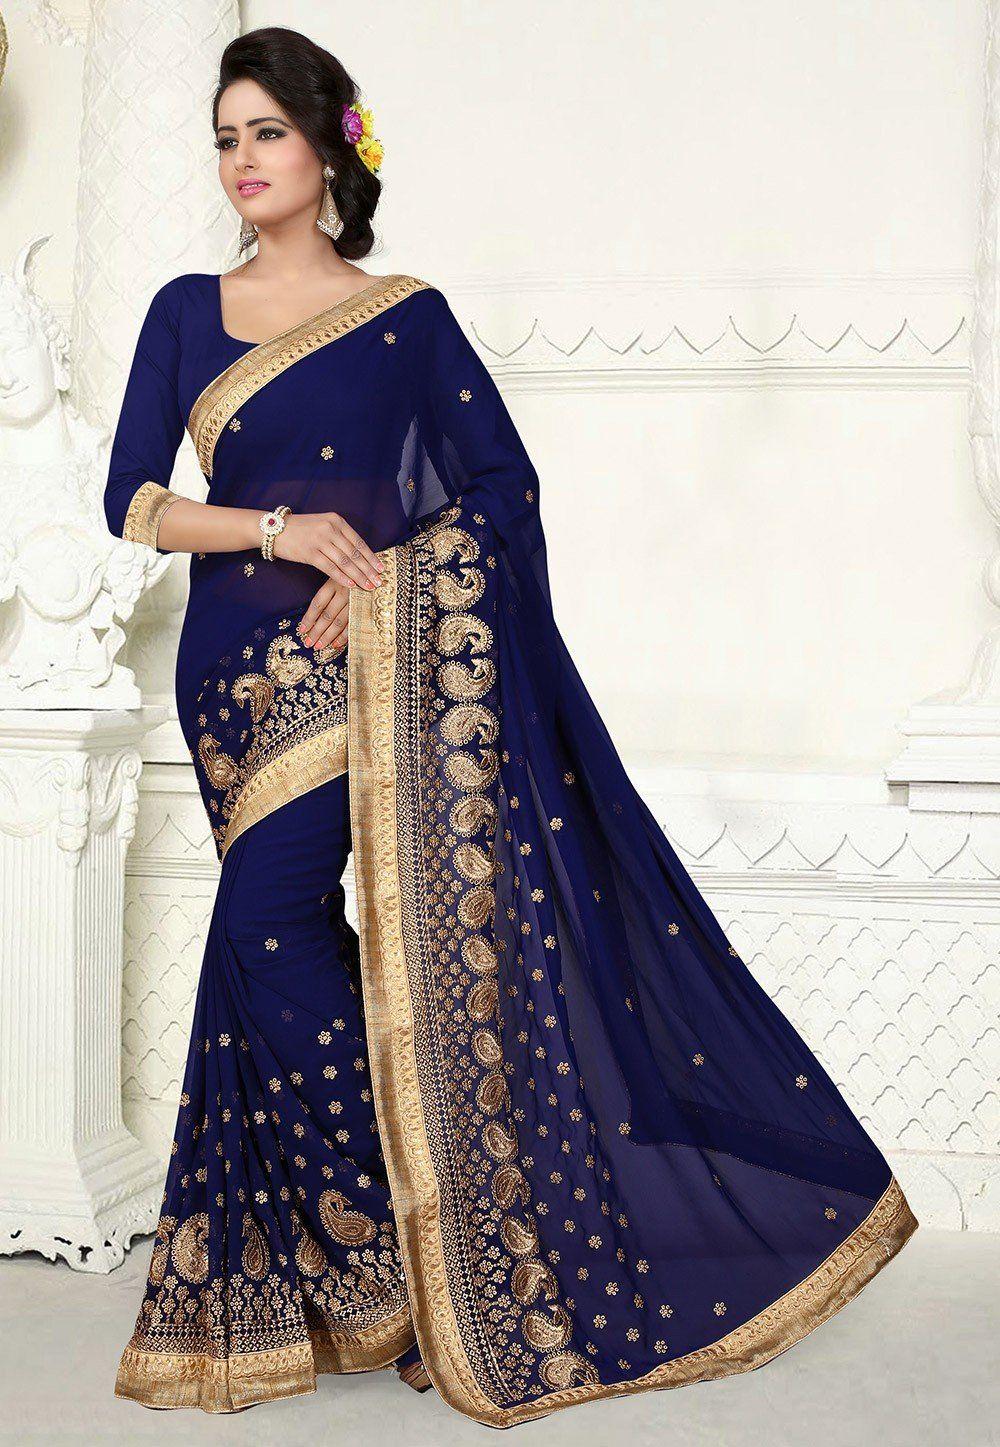 1f2f1ce8f5ad9 Pin by Defne on hint kıyafetleri   Hint kıyafetleri, Hint, Kıyafet